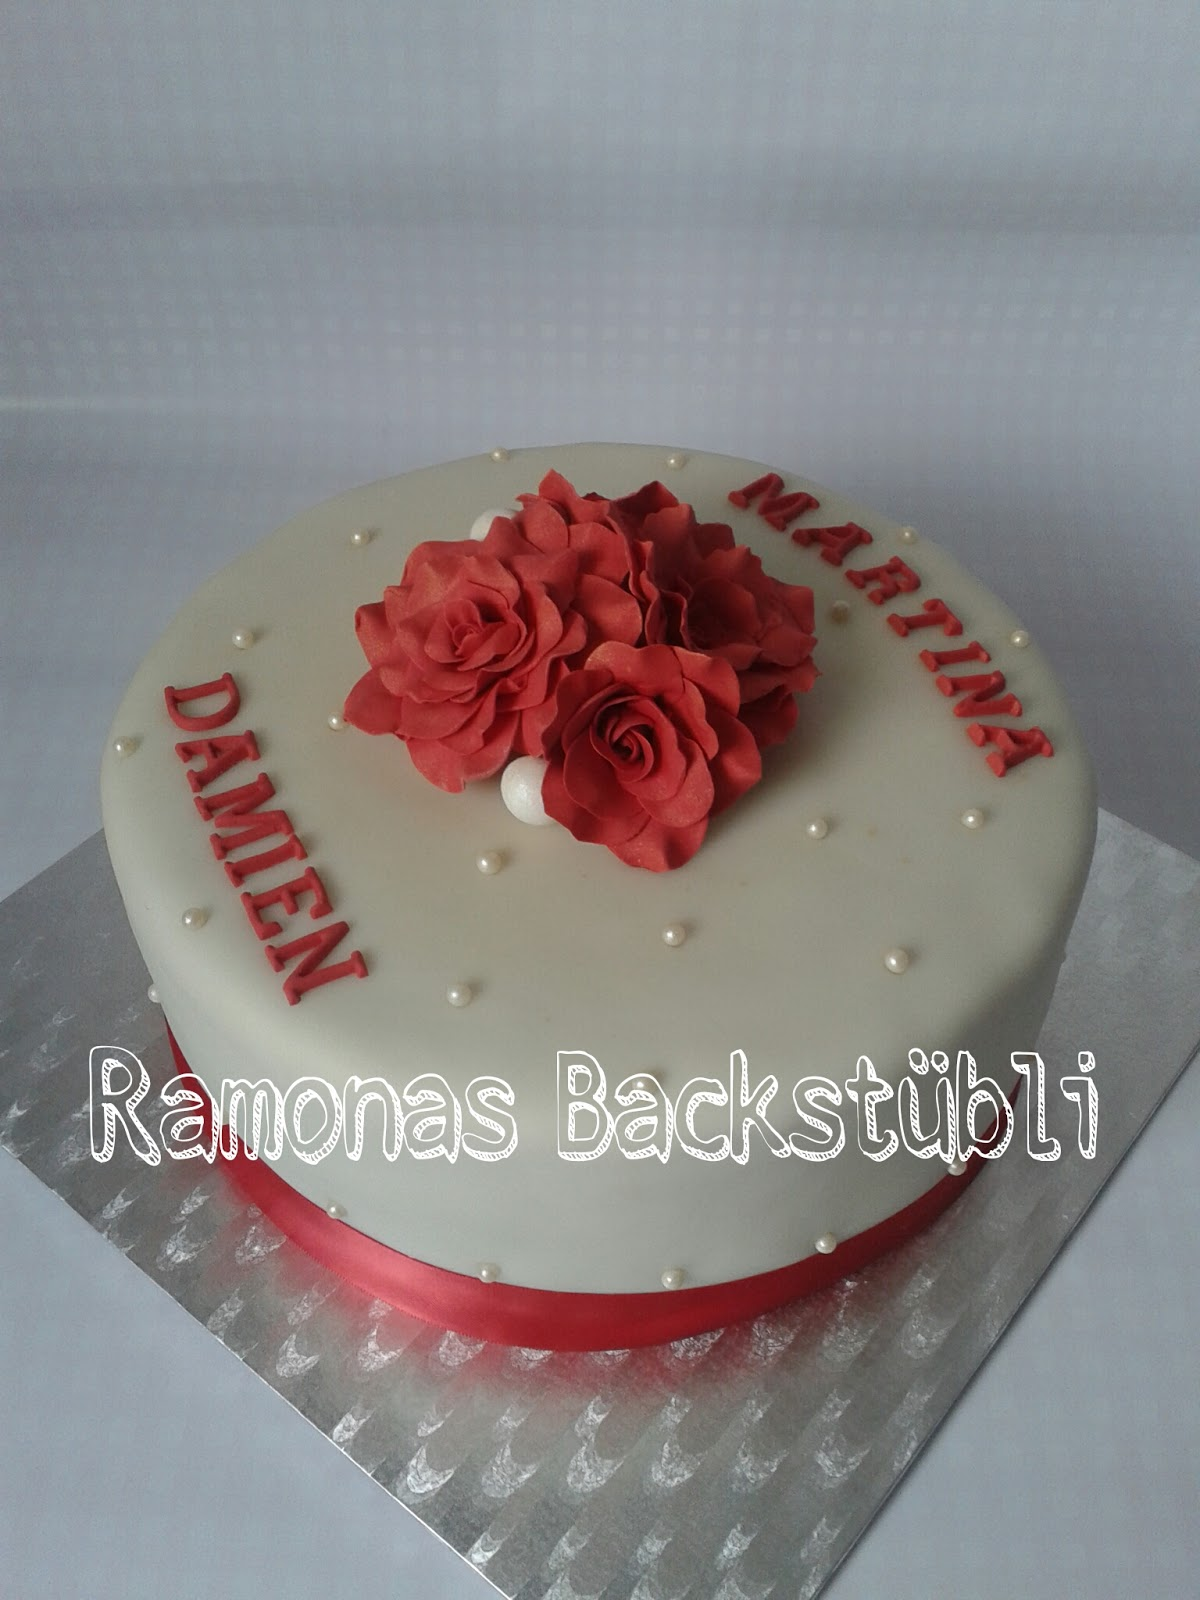 Ramonas Backstubli Hochzeit